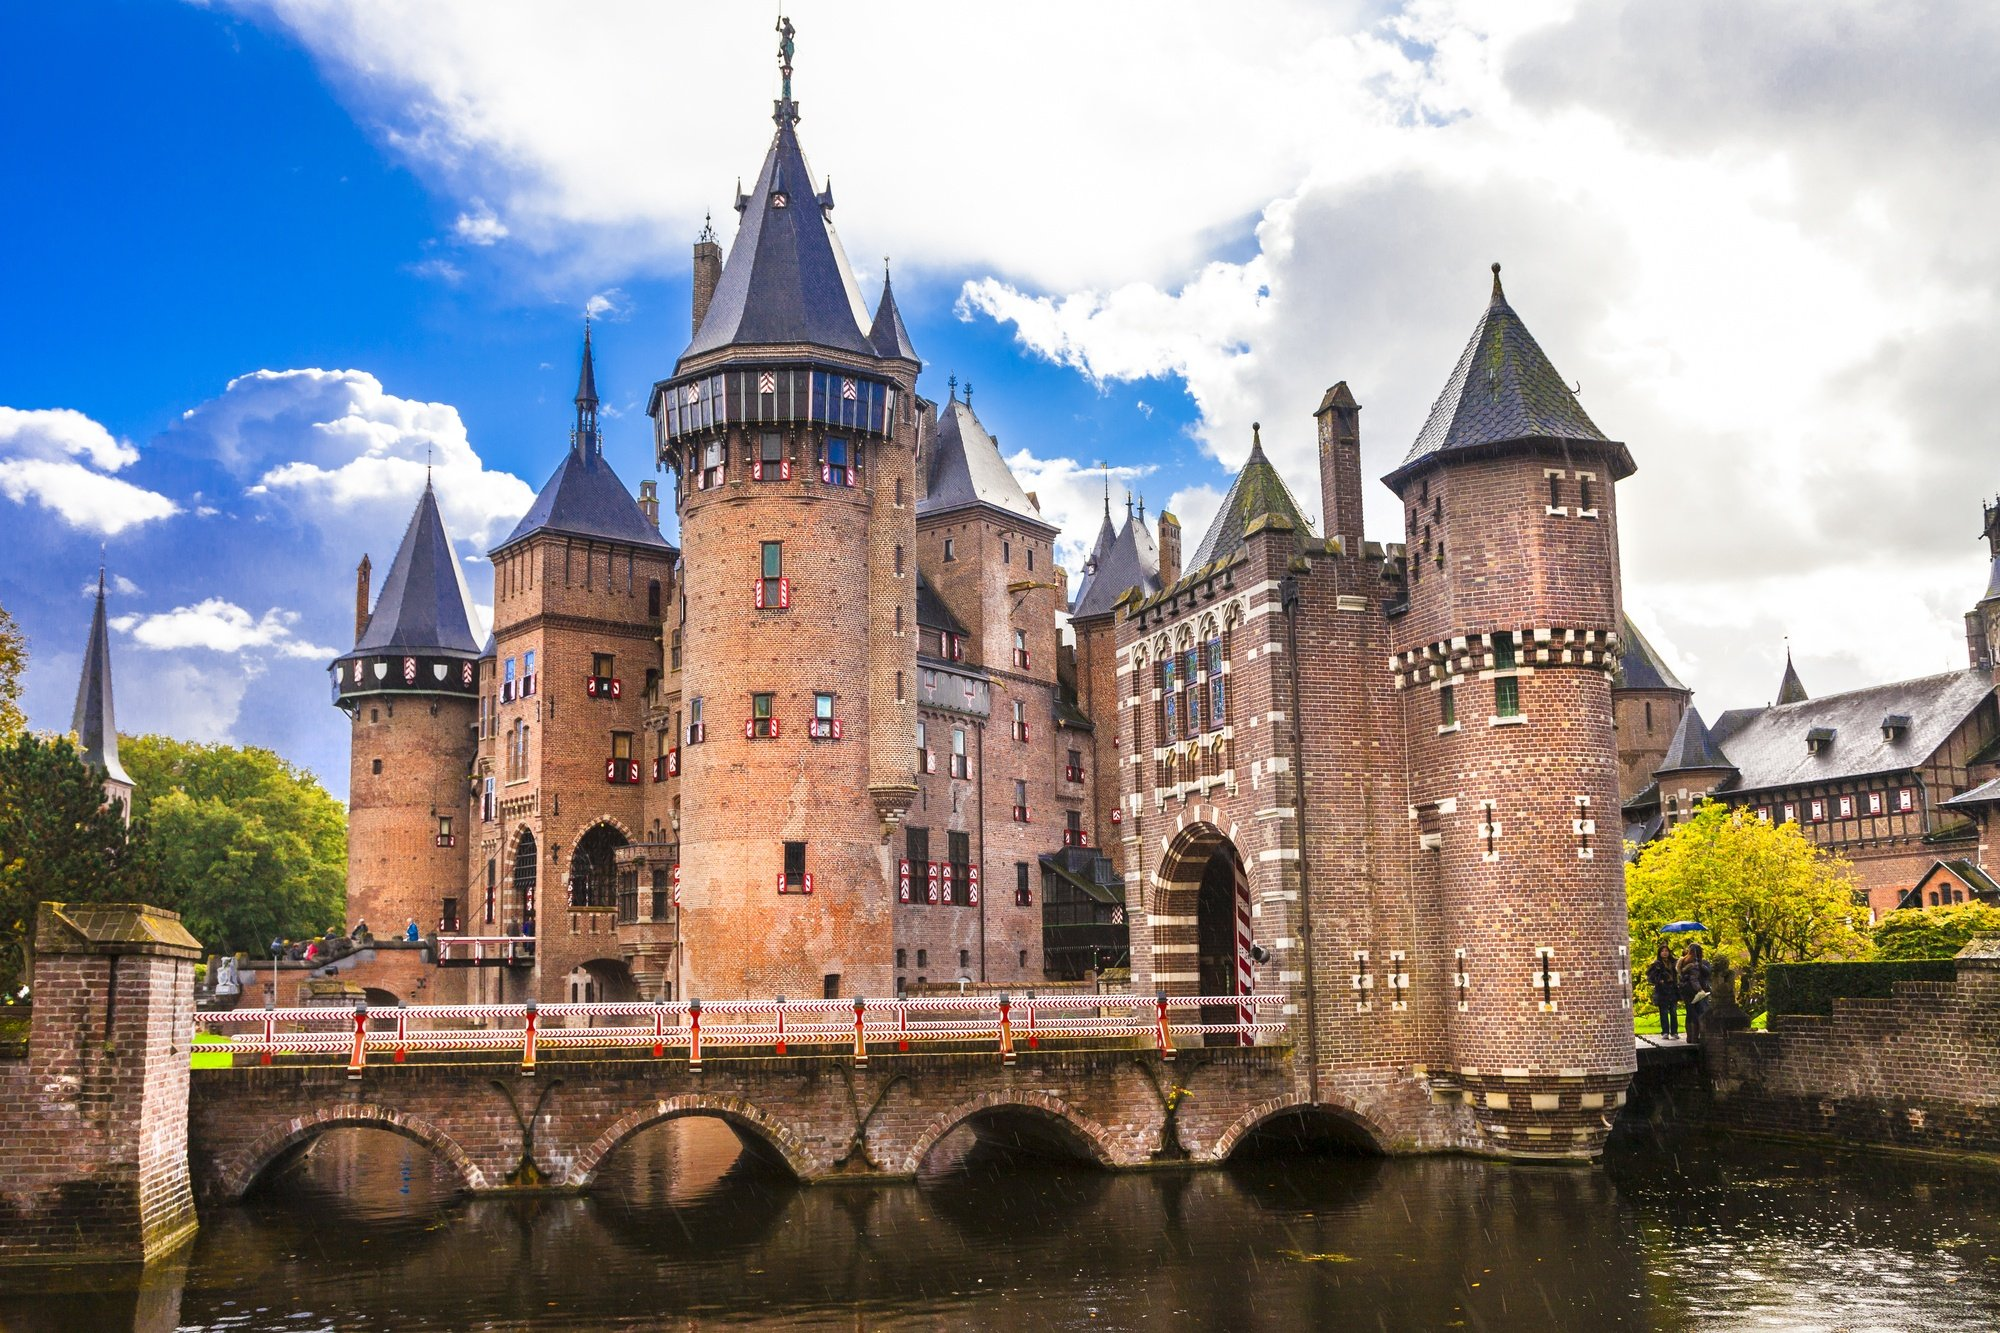 Castle de Haar, the largest castle in the Netherlands